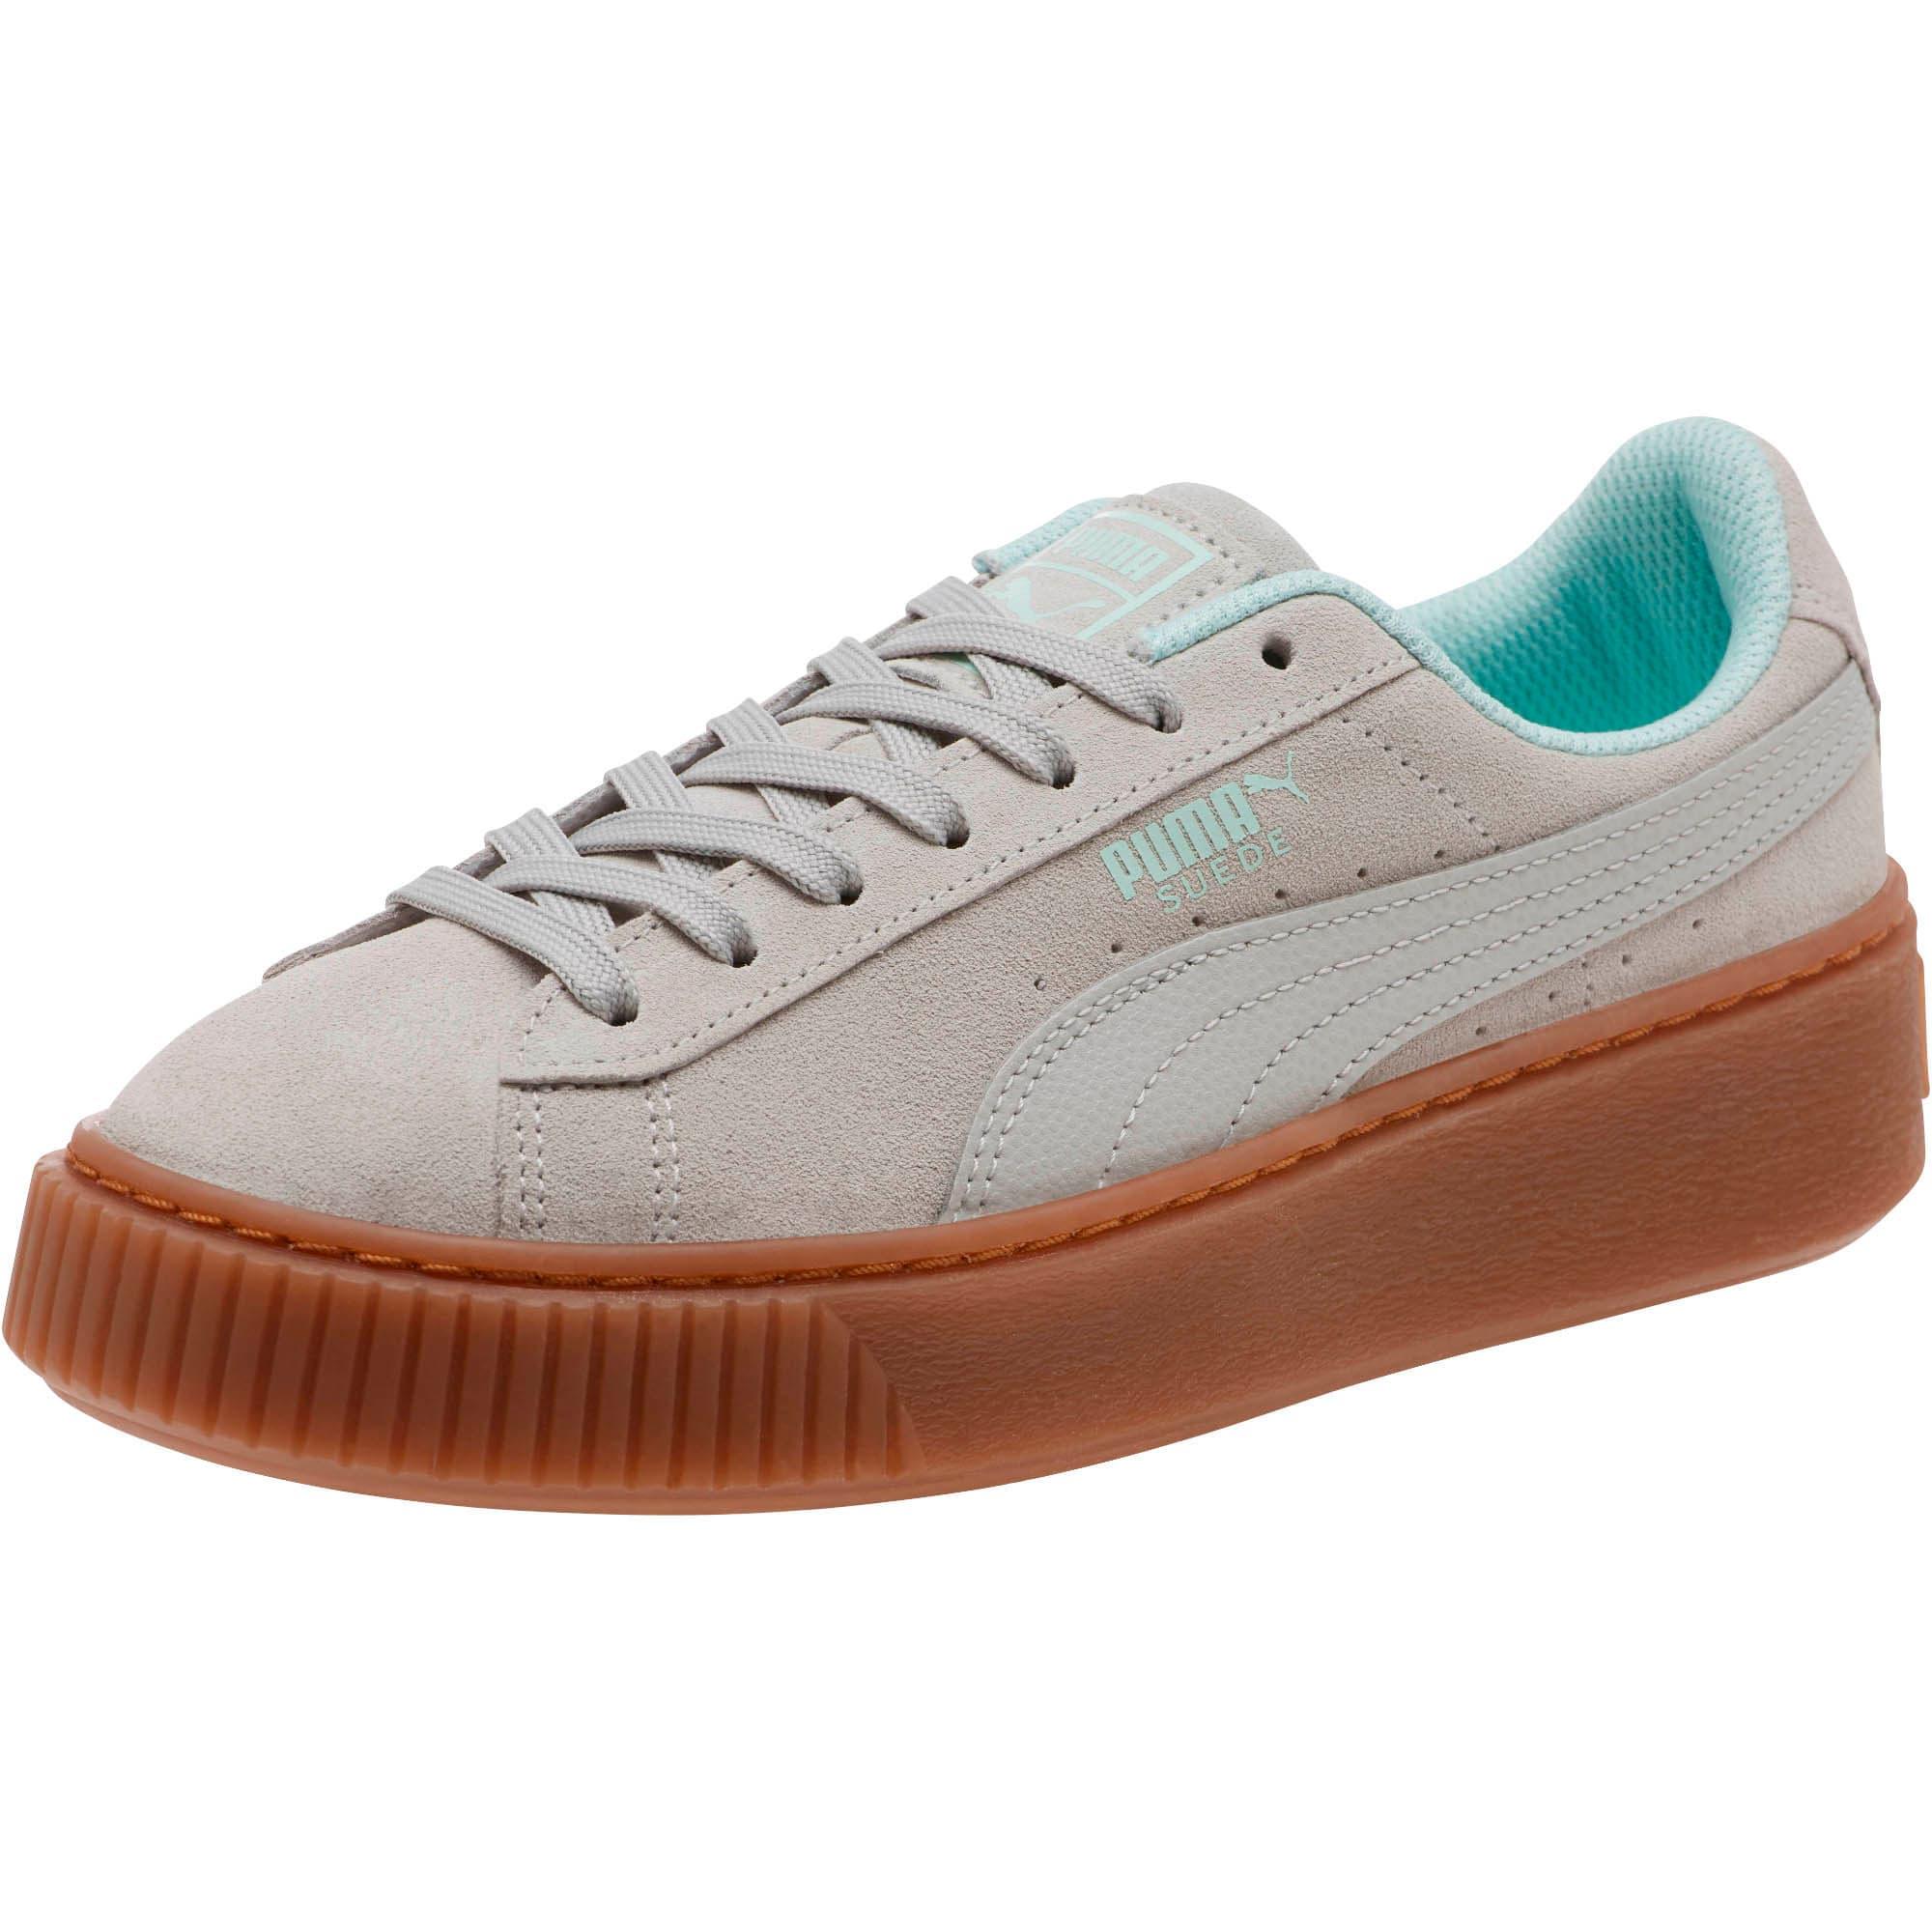 Thumbnail 1 of Suede Platform Radicals Sneakers JR, Gray Violet-Fair Aqua, medium